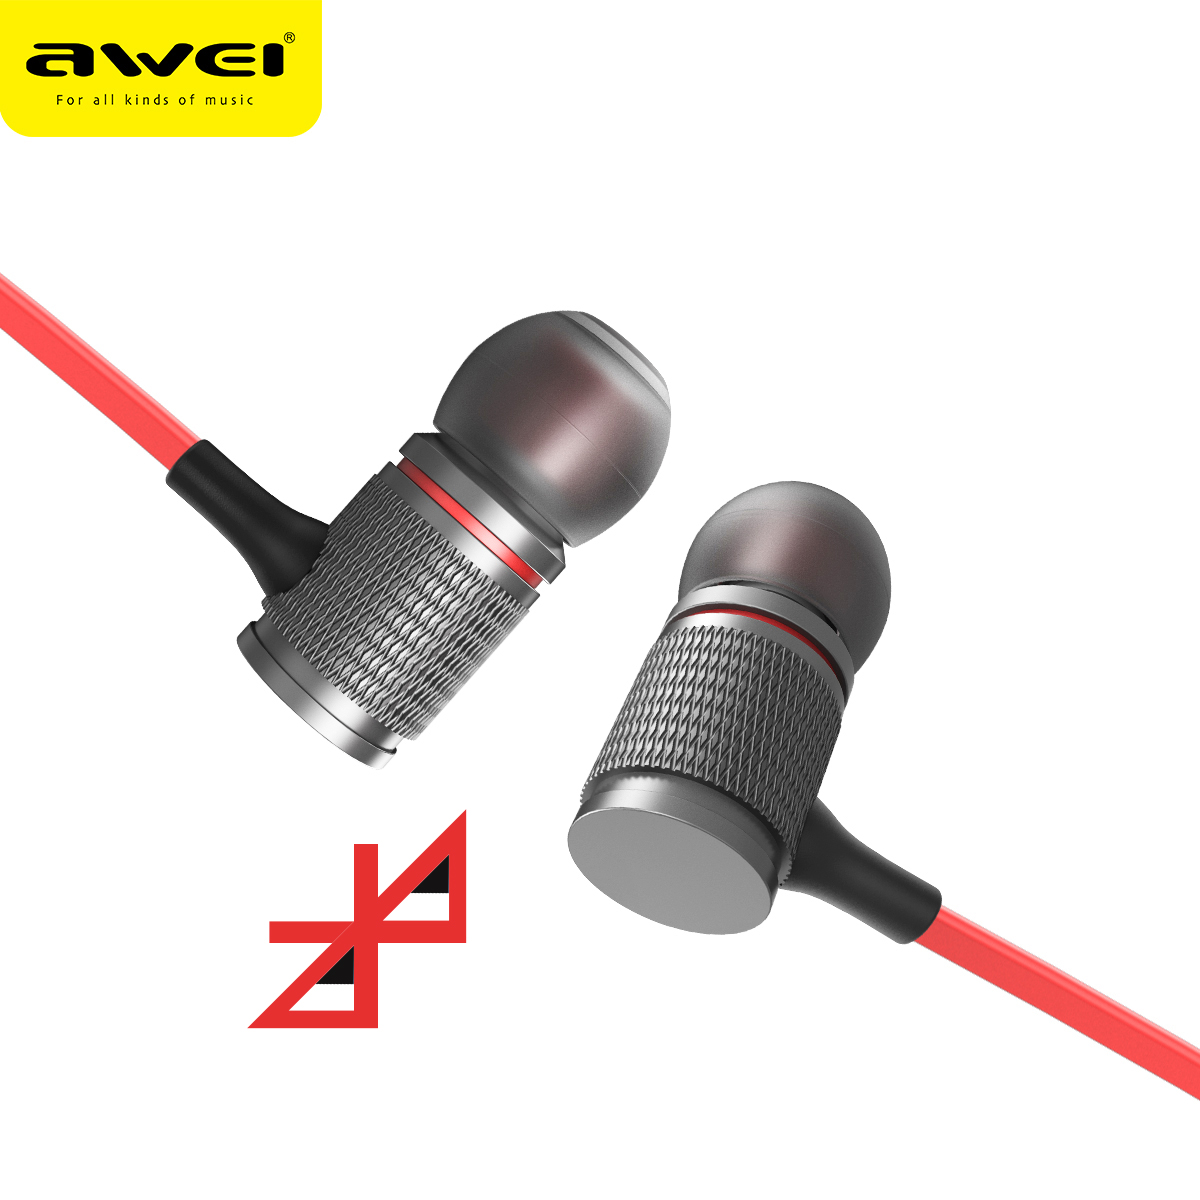 T12 AWEI Auriculares Bluetooth Para Auriculares Inalámbricos estéreo Para Auriculares Del Teléfono kulakl k Auricular Inalámbrico Bluetooth Casque V4.2